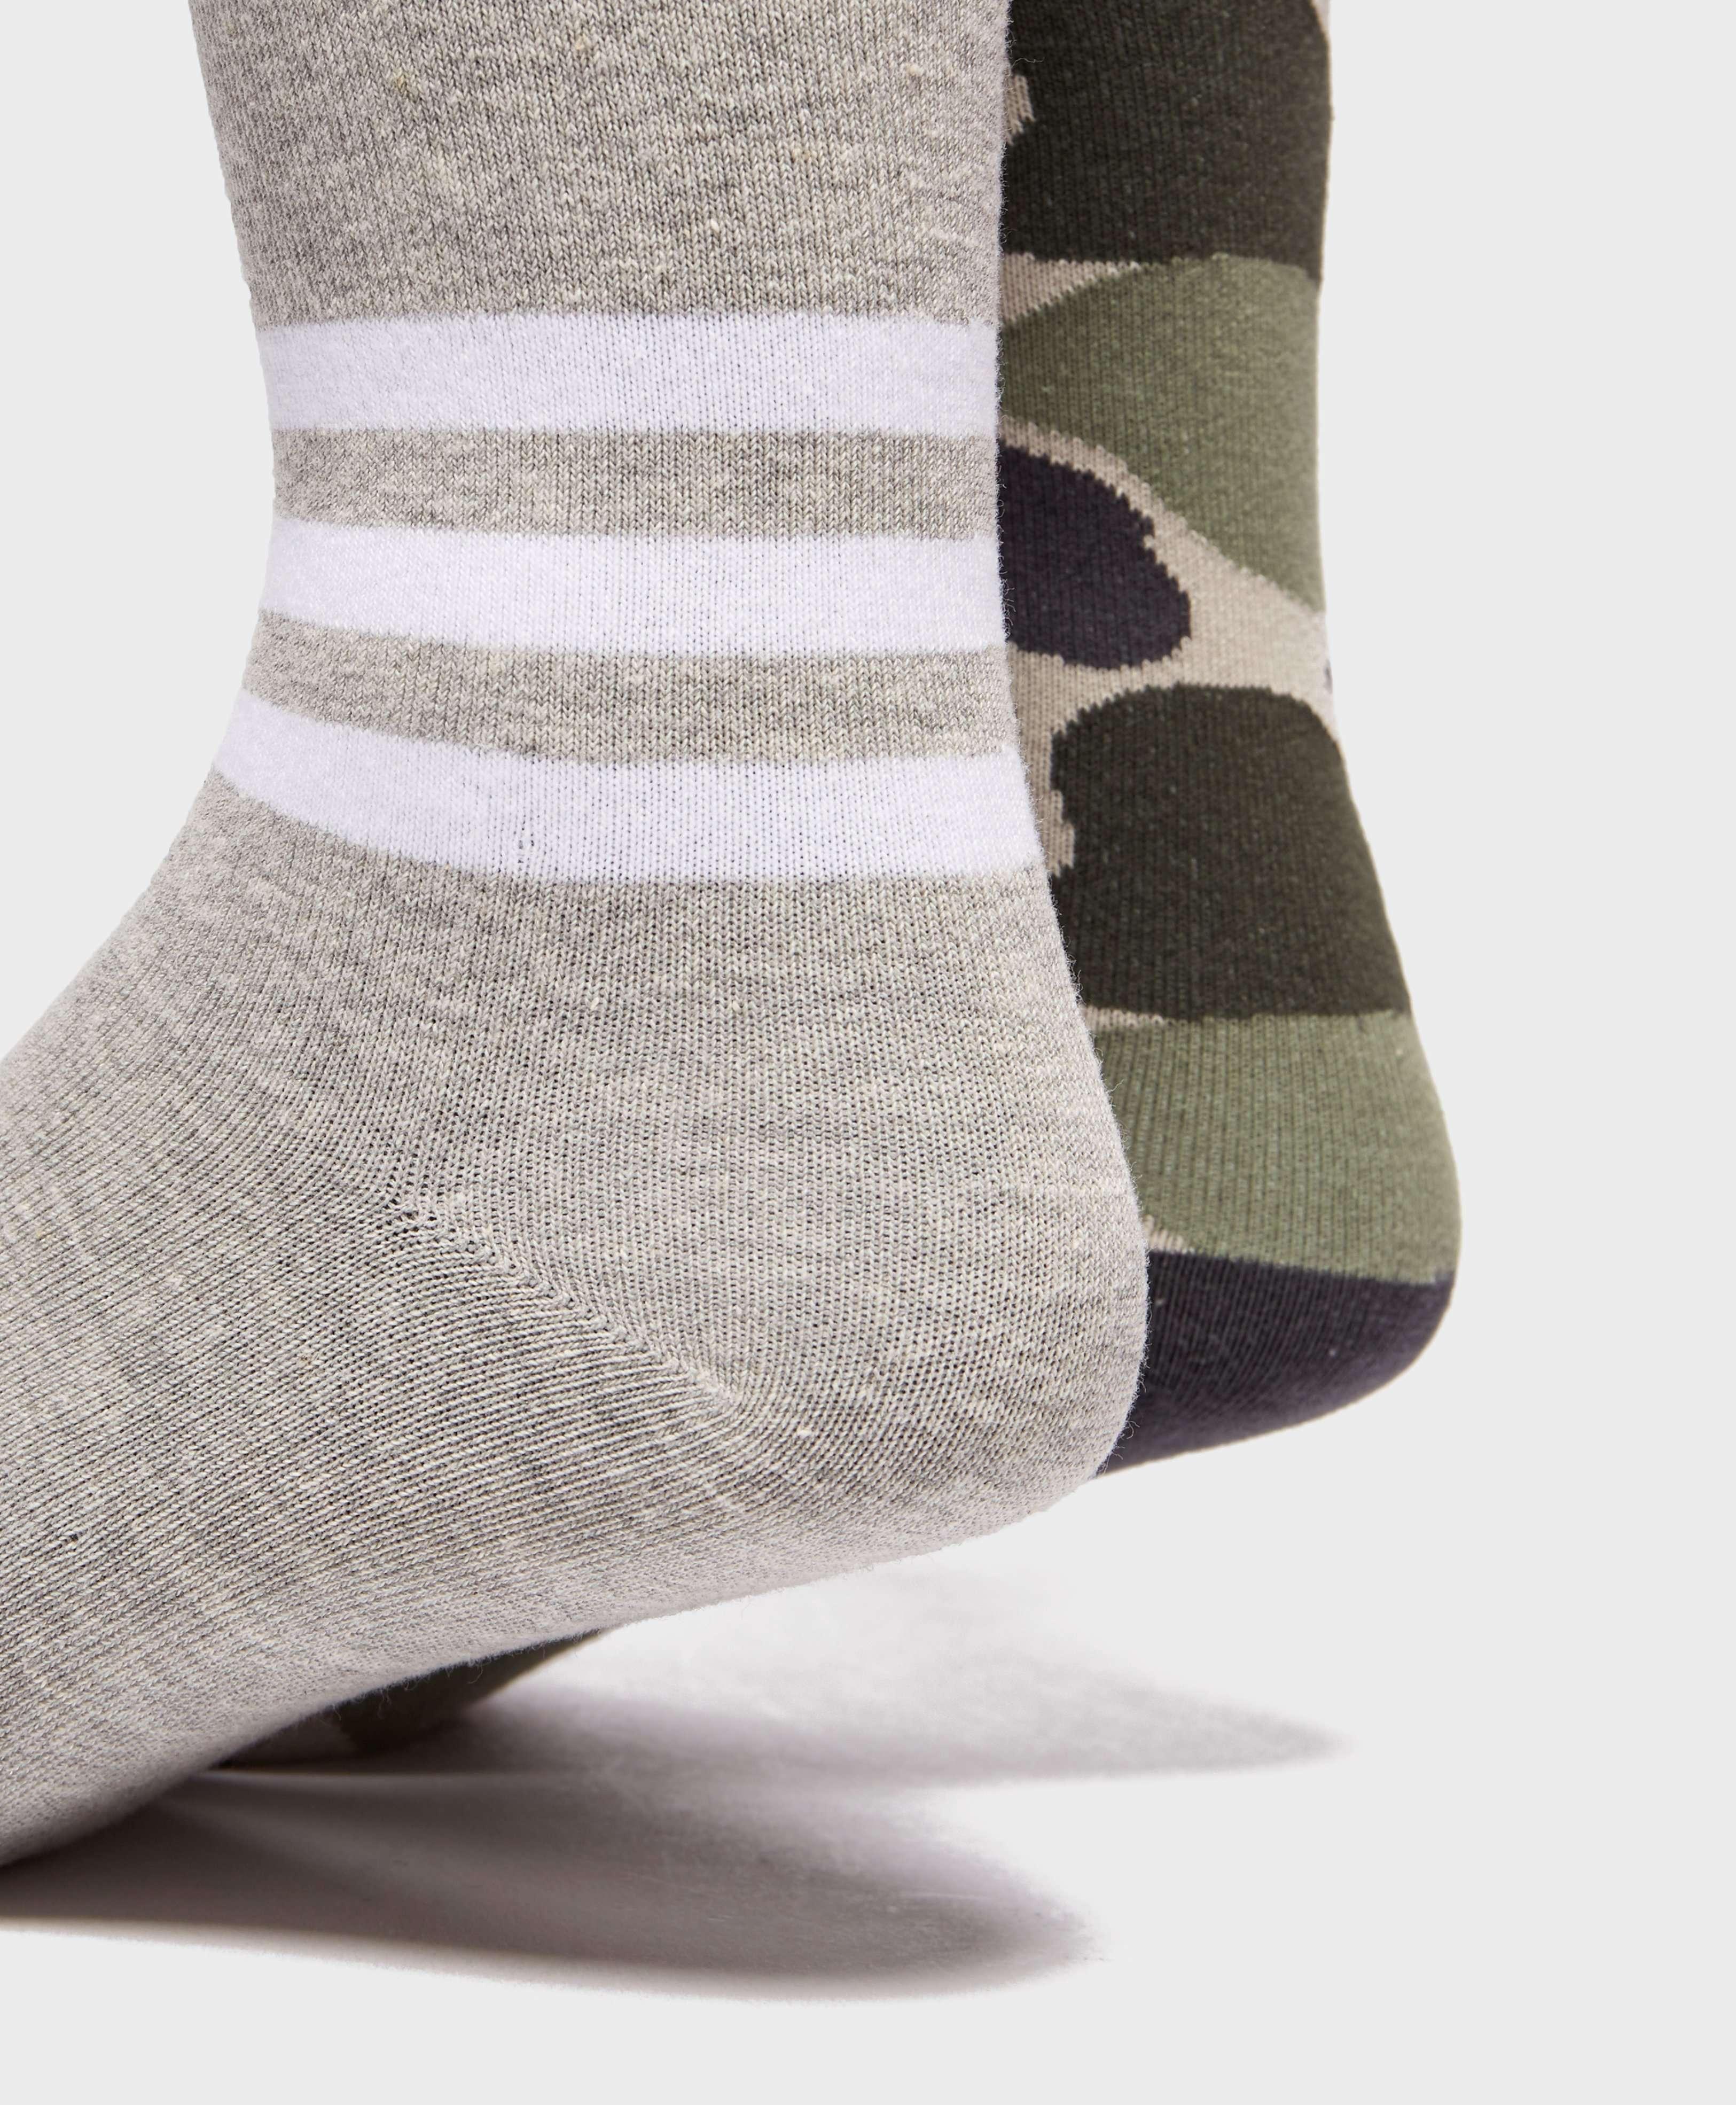 adidas Originals 2-Pack Camouflage Socks